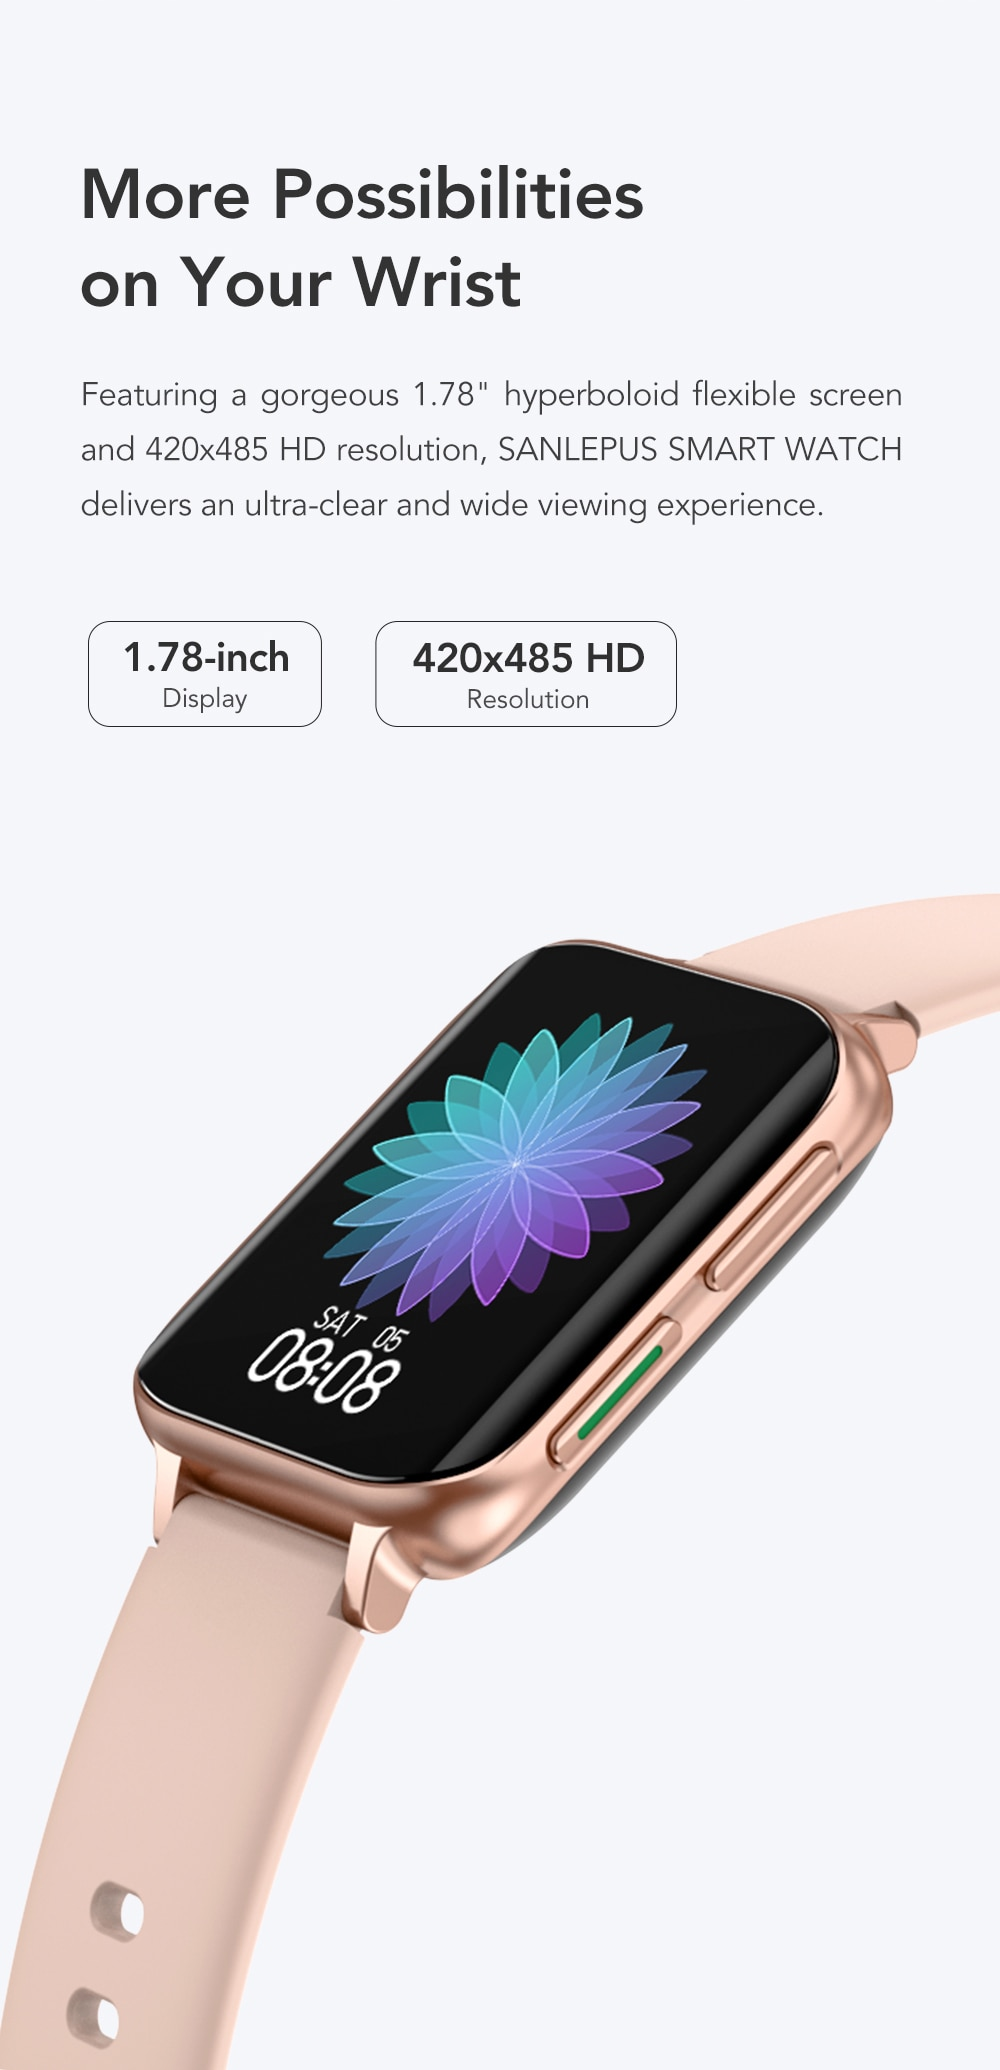 Hde7682a115aa4cc1b4b1493c59fd513cL SANLEPUS 2021 NEW Dial Calls Smart Watch Men Women Waterproof Smartwatch MP3 Player For OPPO Android Apple Xiaomi Huawei